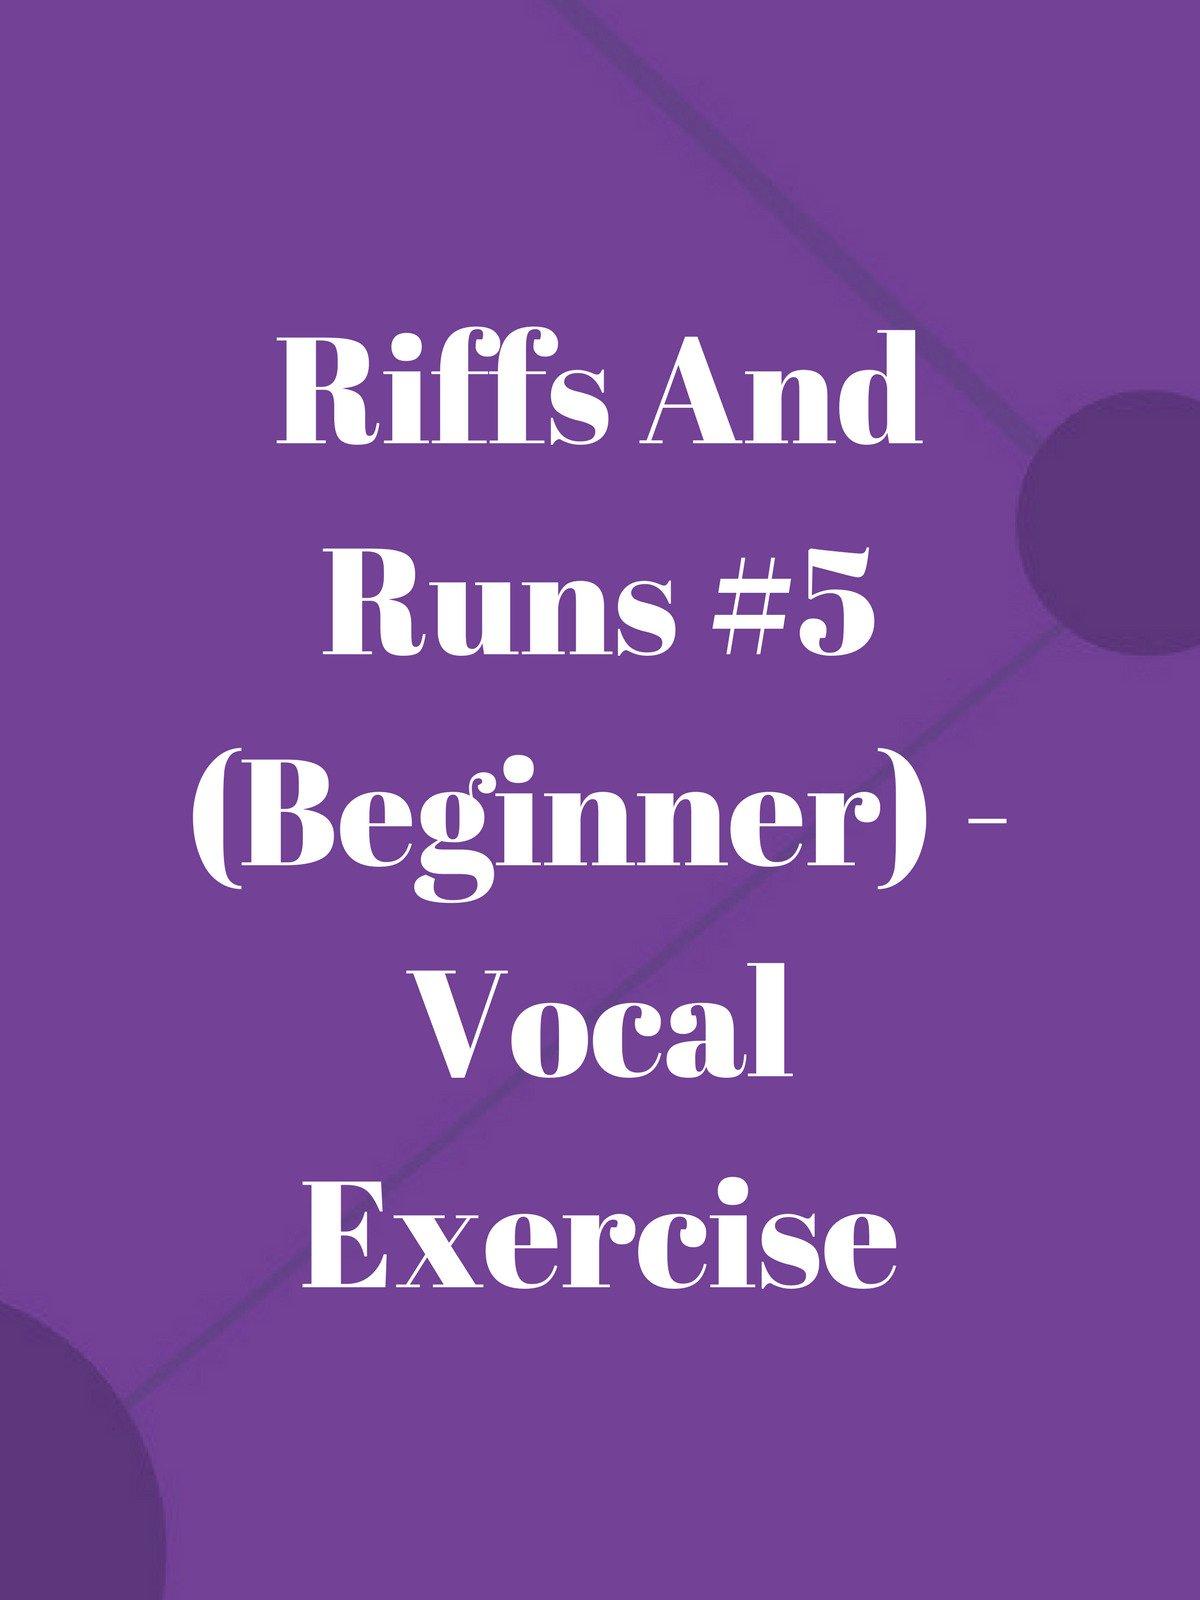 Riffs And Runs #5 (Beginner)